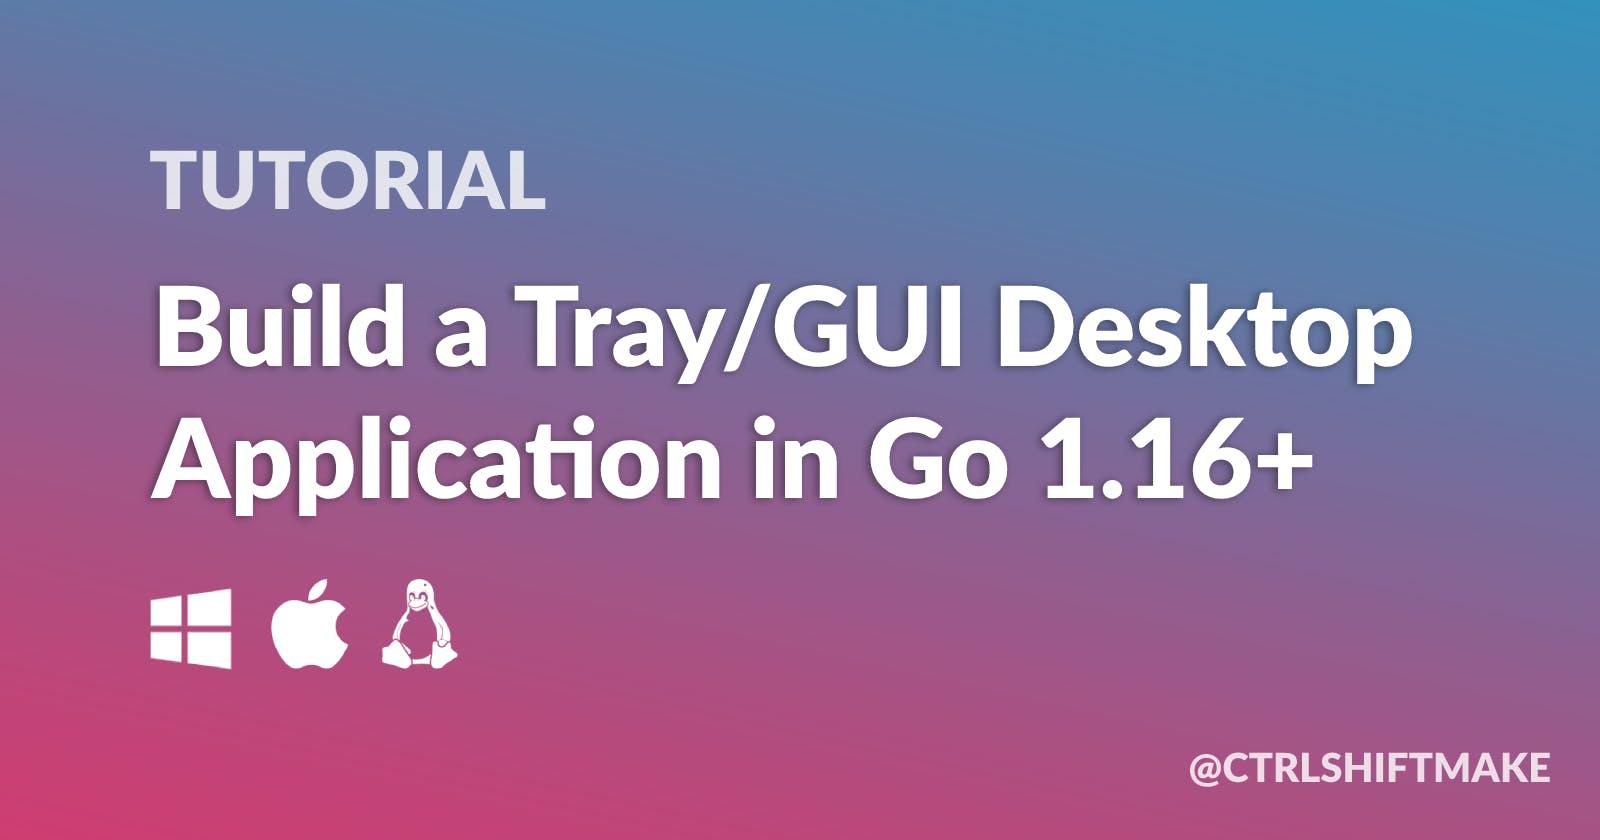 Build a Tray/GUI Desktop Application in Go 1.16+